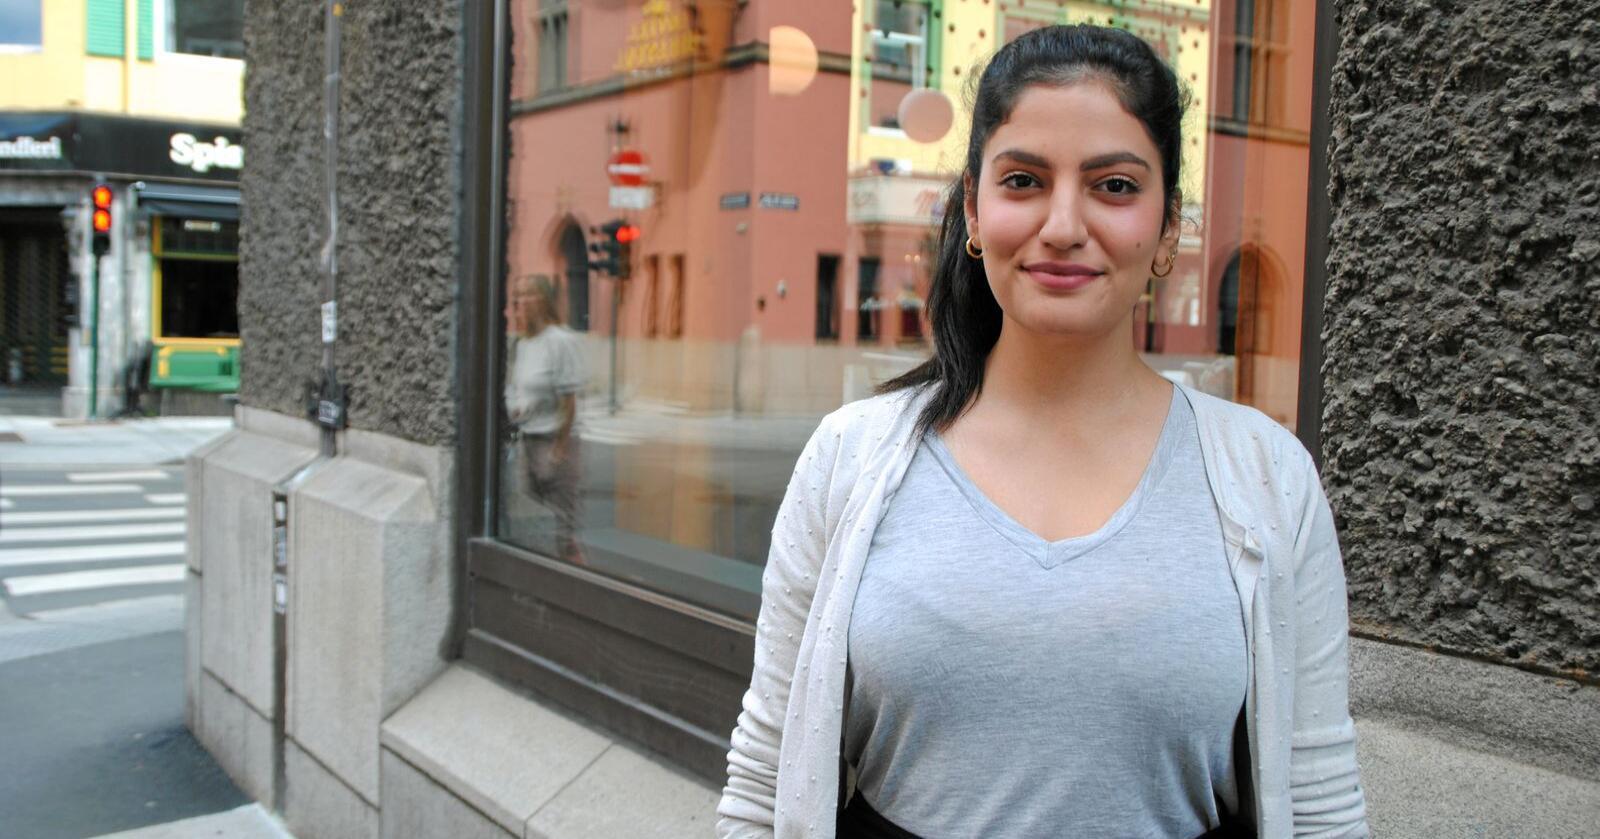 Nadine Al-Mustafa er politiker i Oslo Senterpartiet. Hun er vokst opp på Furuset i Oslo. Foto: Lars Bilit Hagen